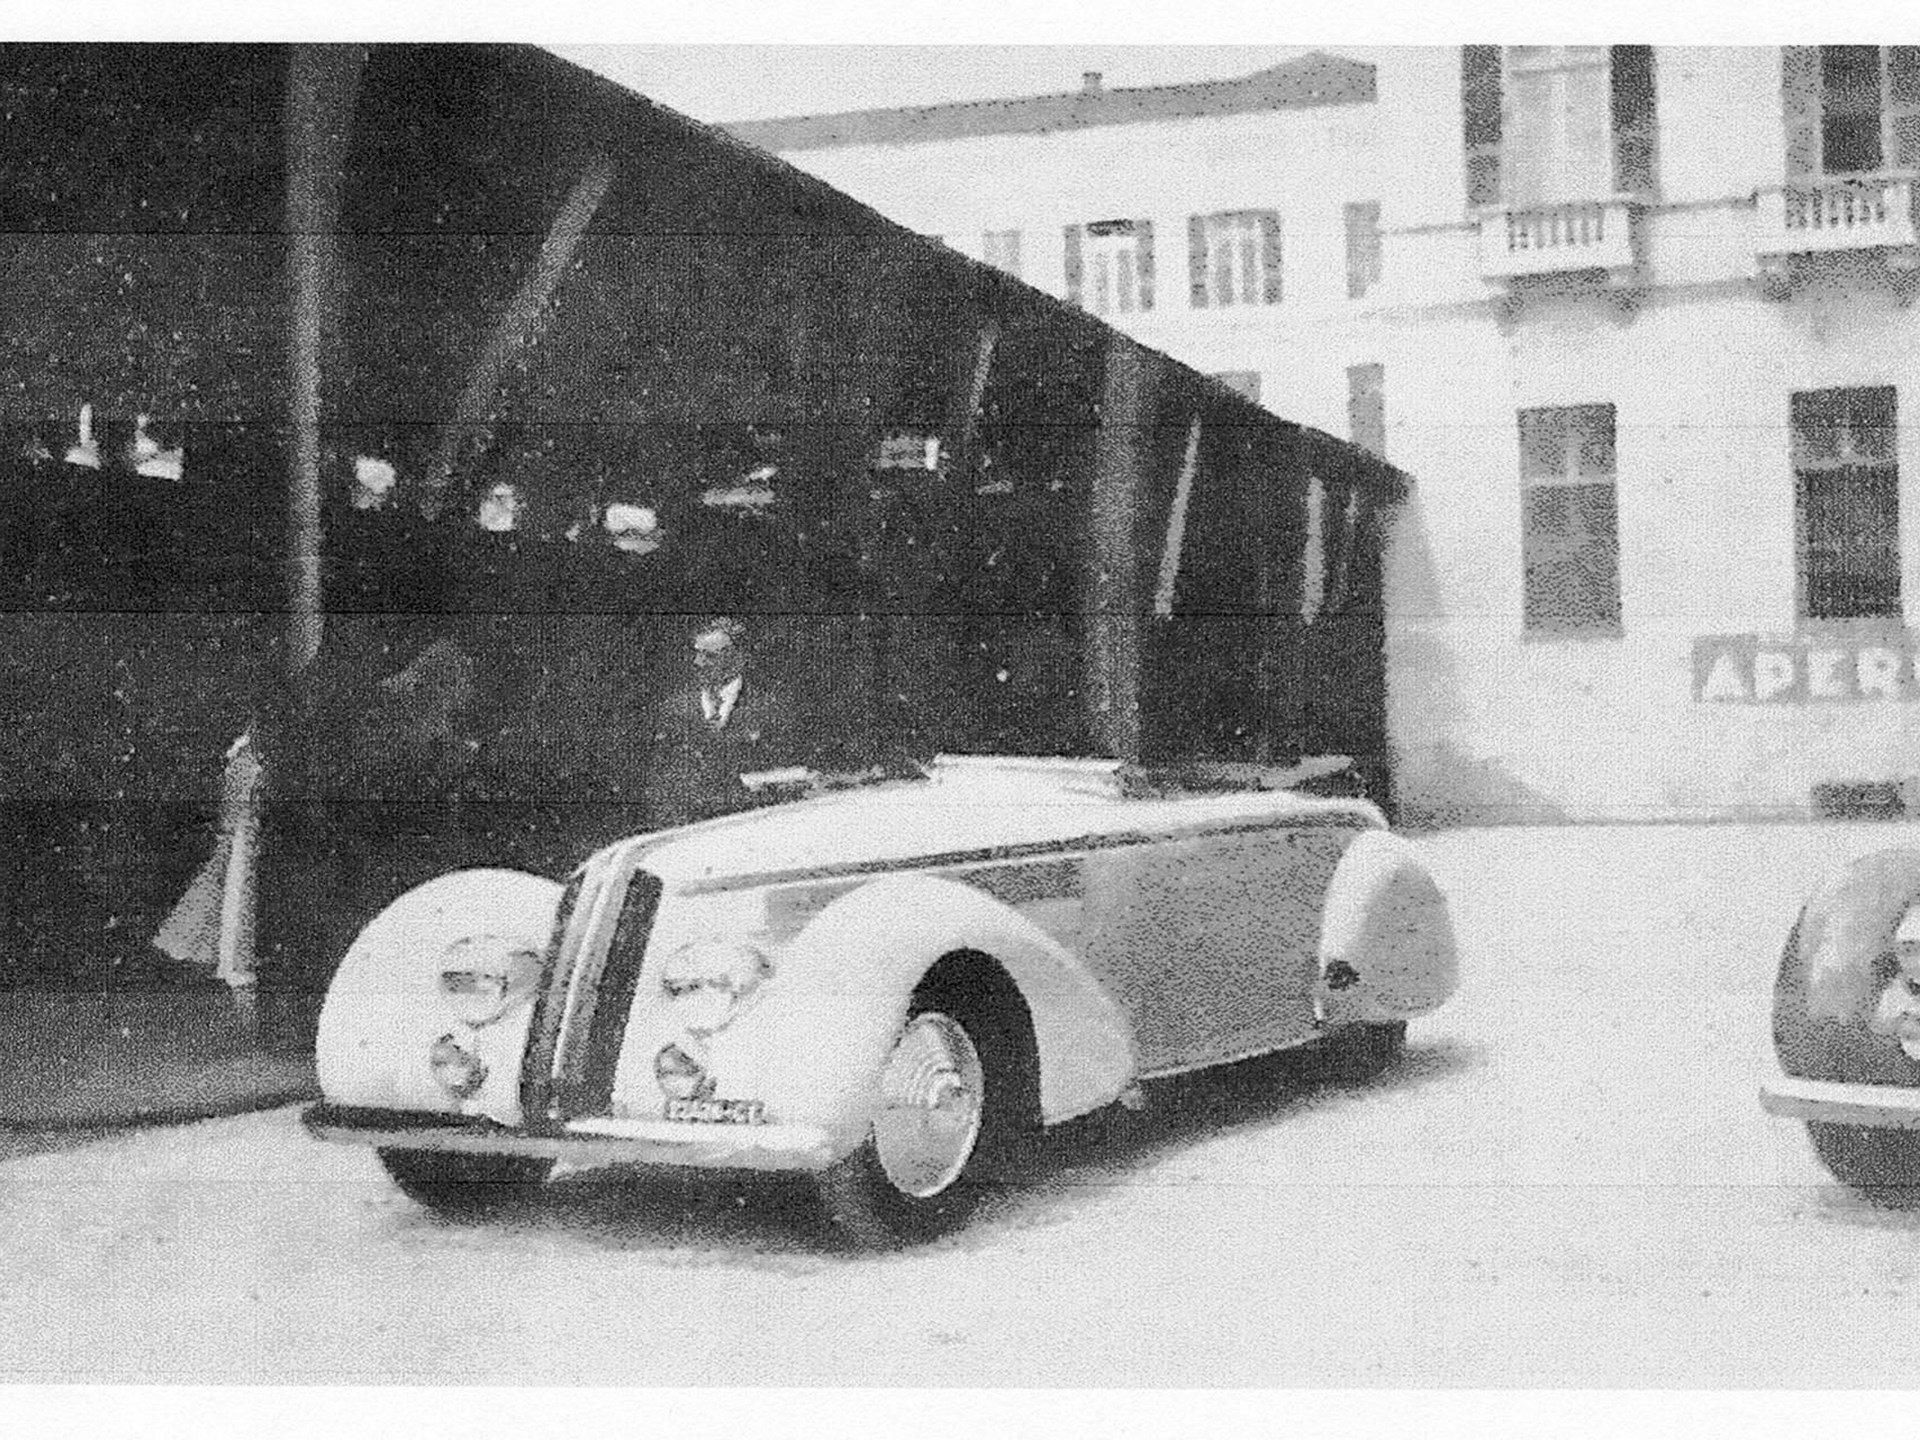 This cabriolet at the inaugural Concorso d'Eleganza per Automobili, San Remo, where it received a class award.